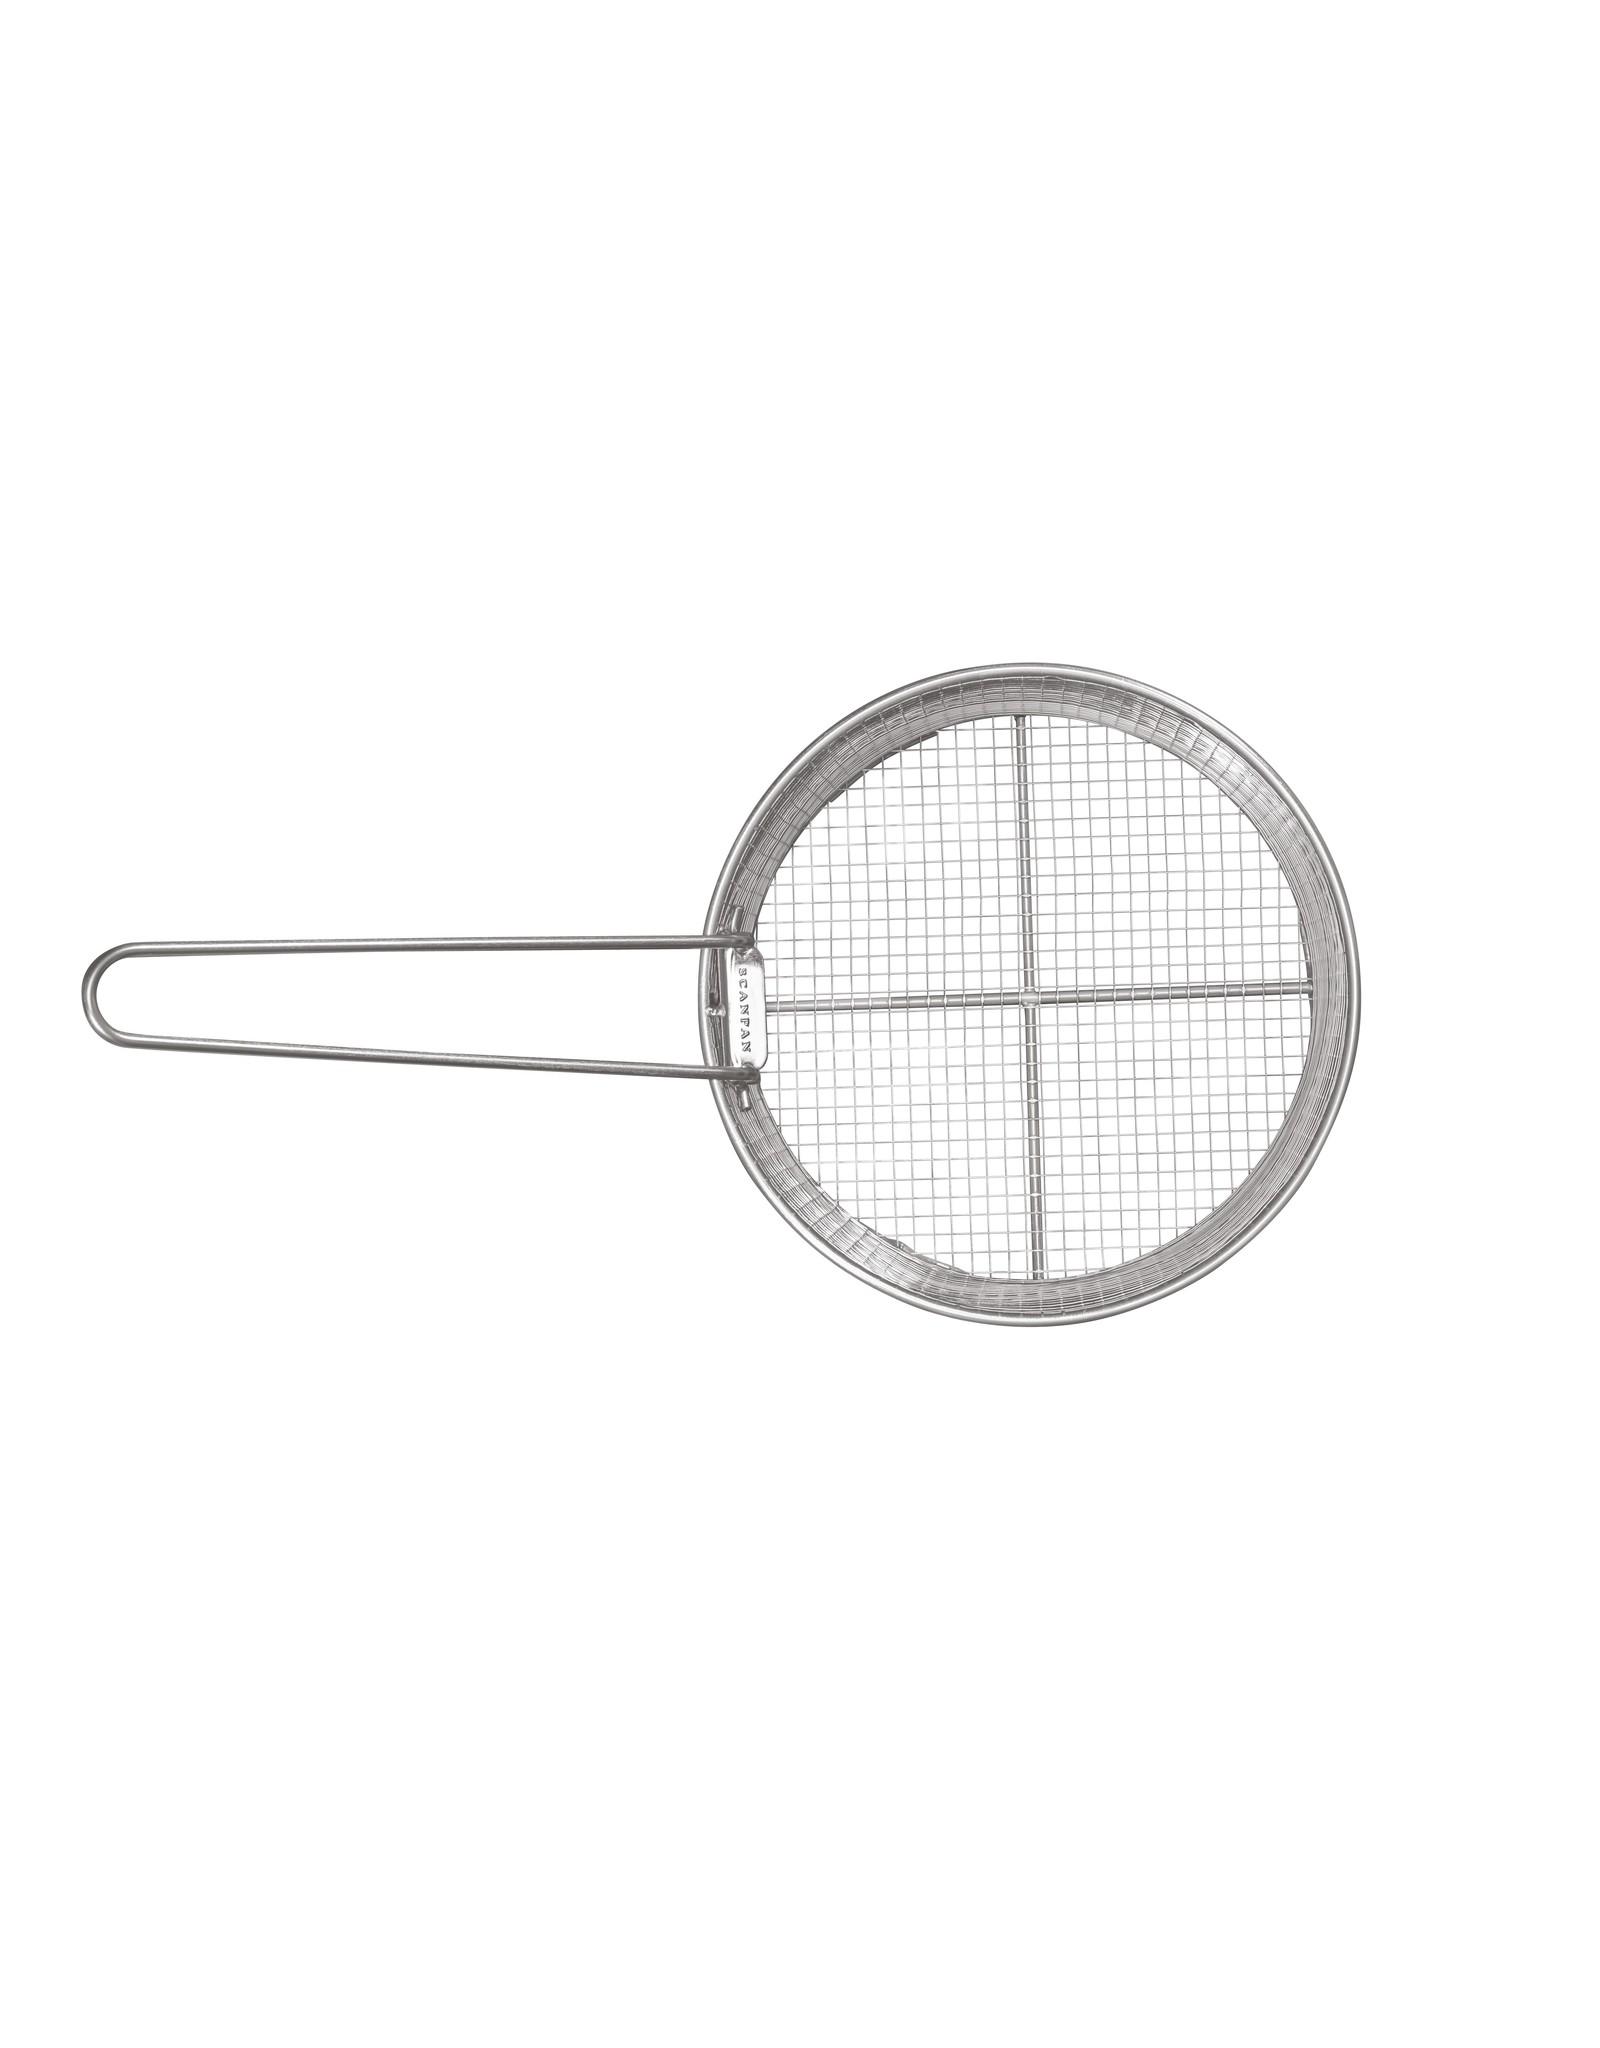 Scanpan TechnIQ kook-/ frituurmand